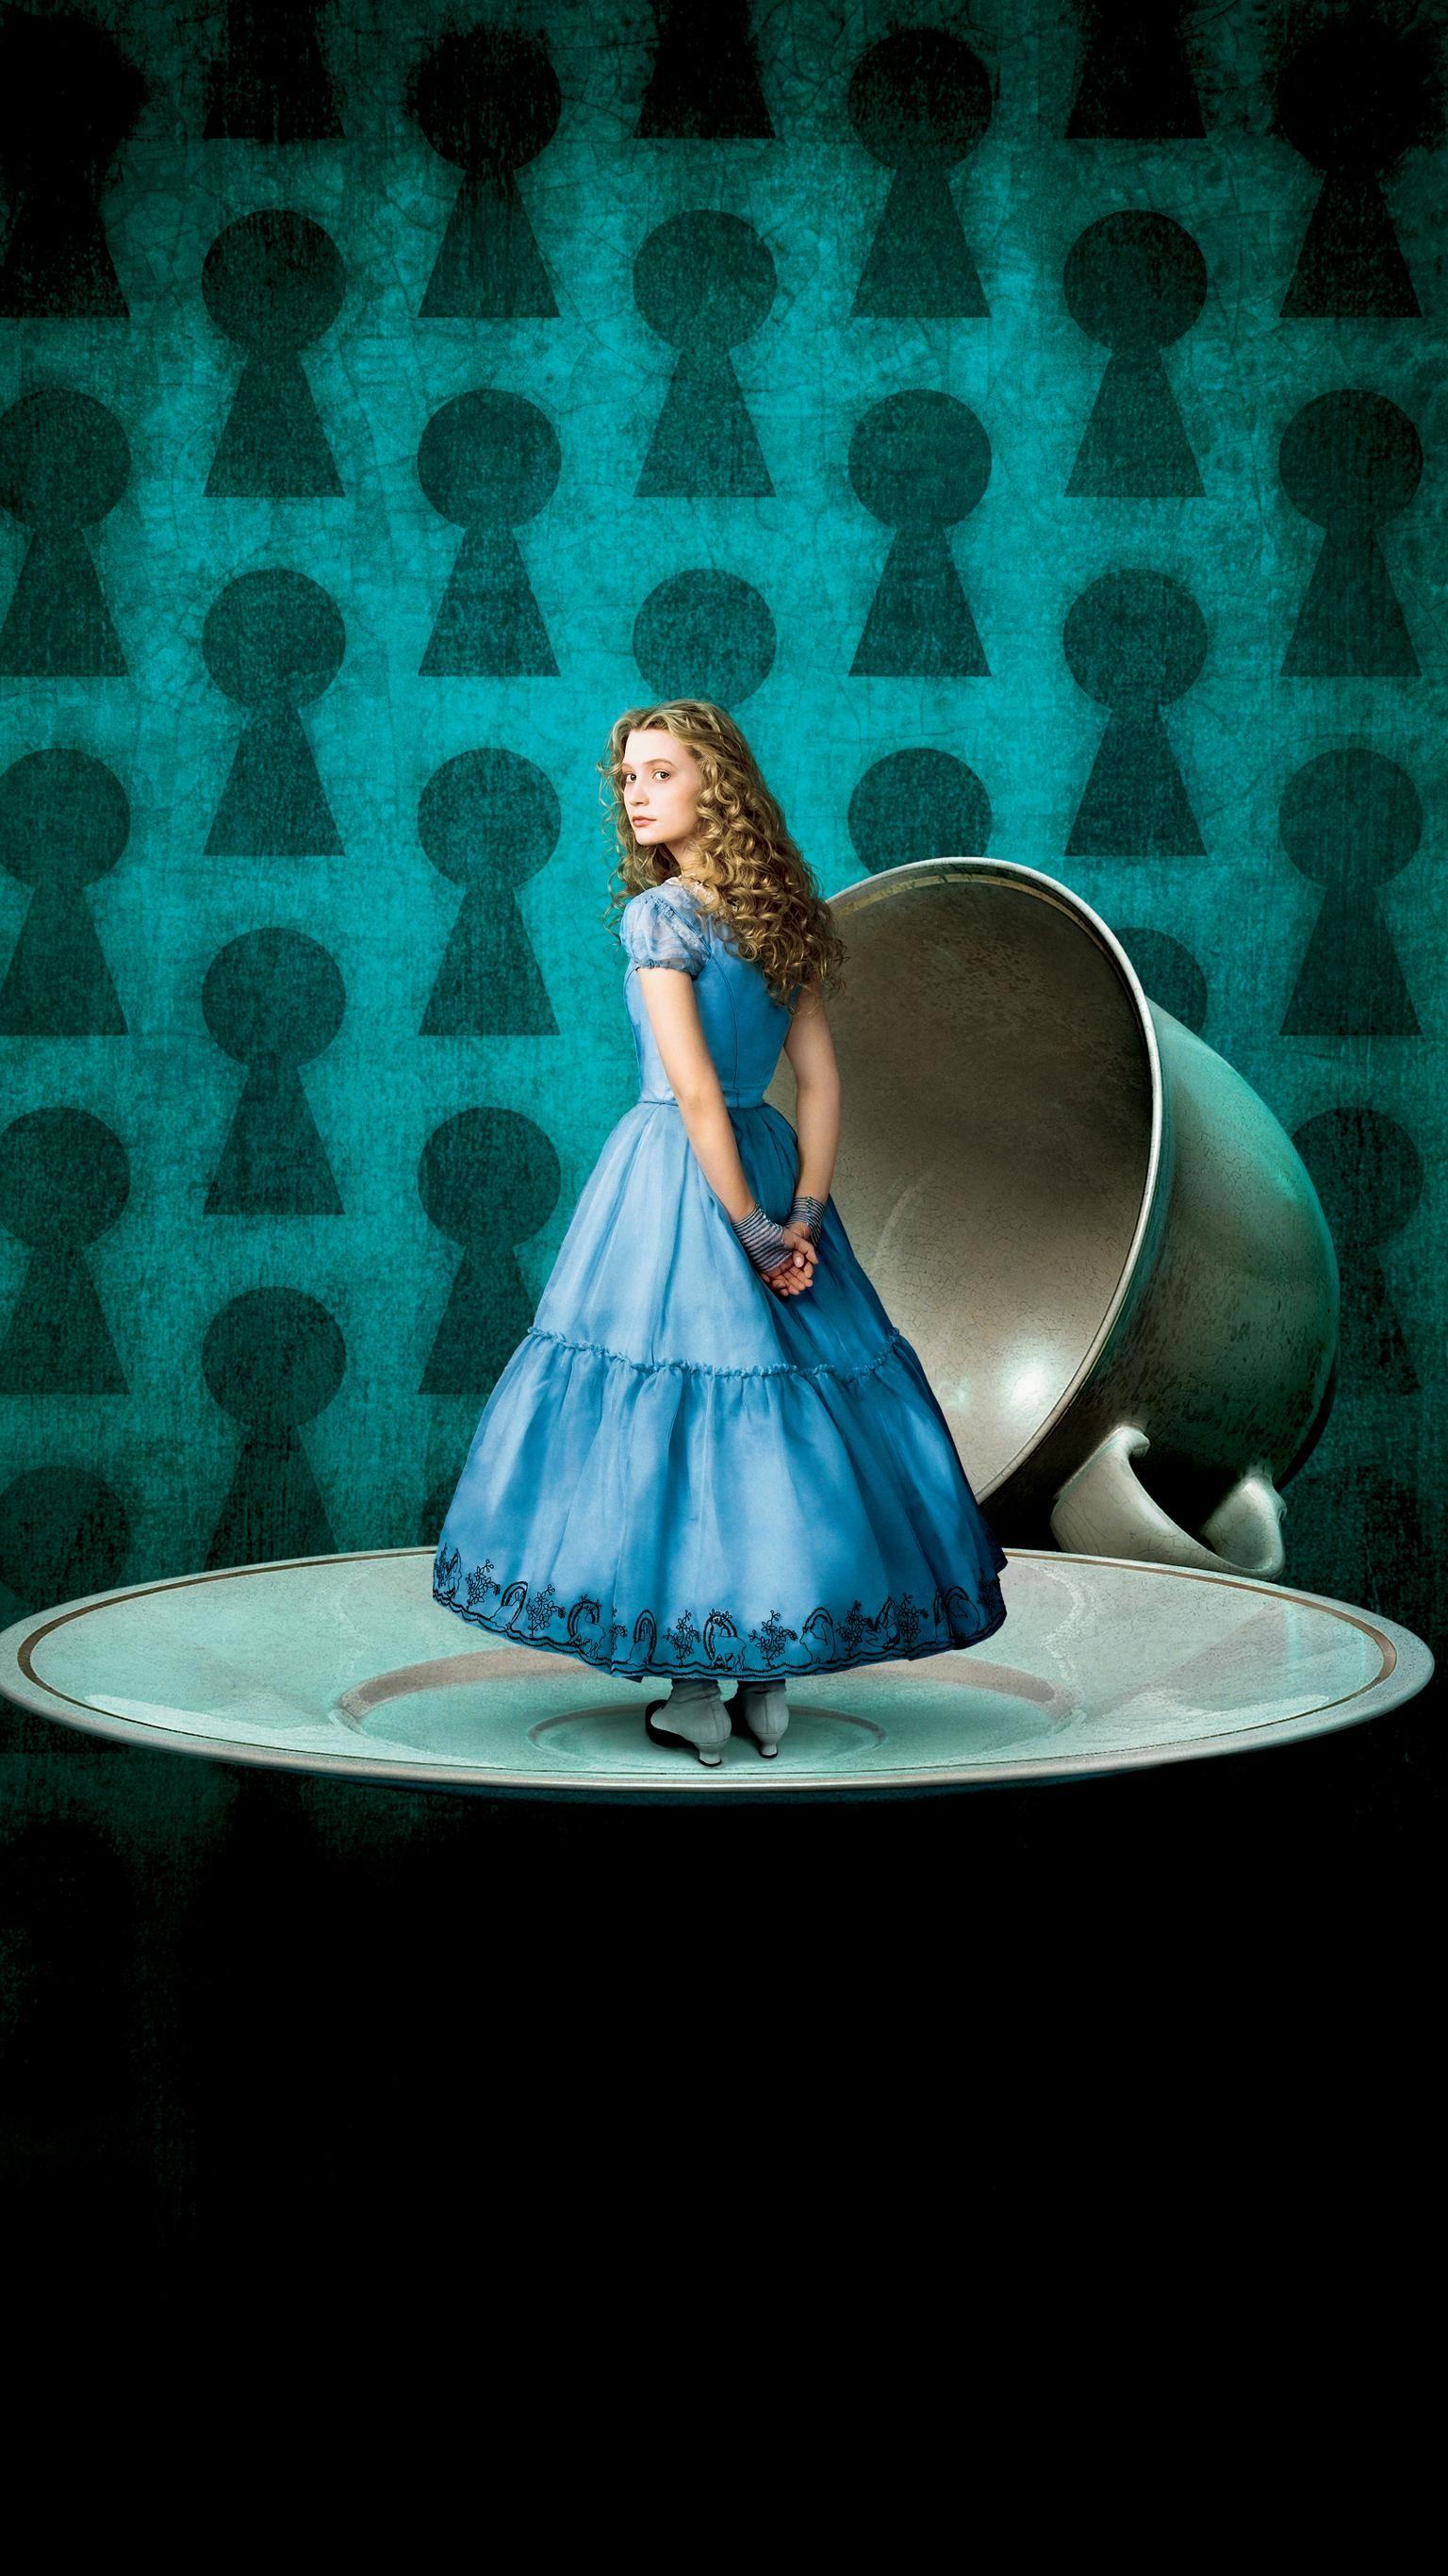 Alice in Wonderland (2010) Phone Wallpaper | Alice, Wallpaper and ...